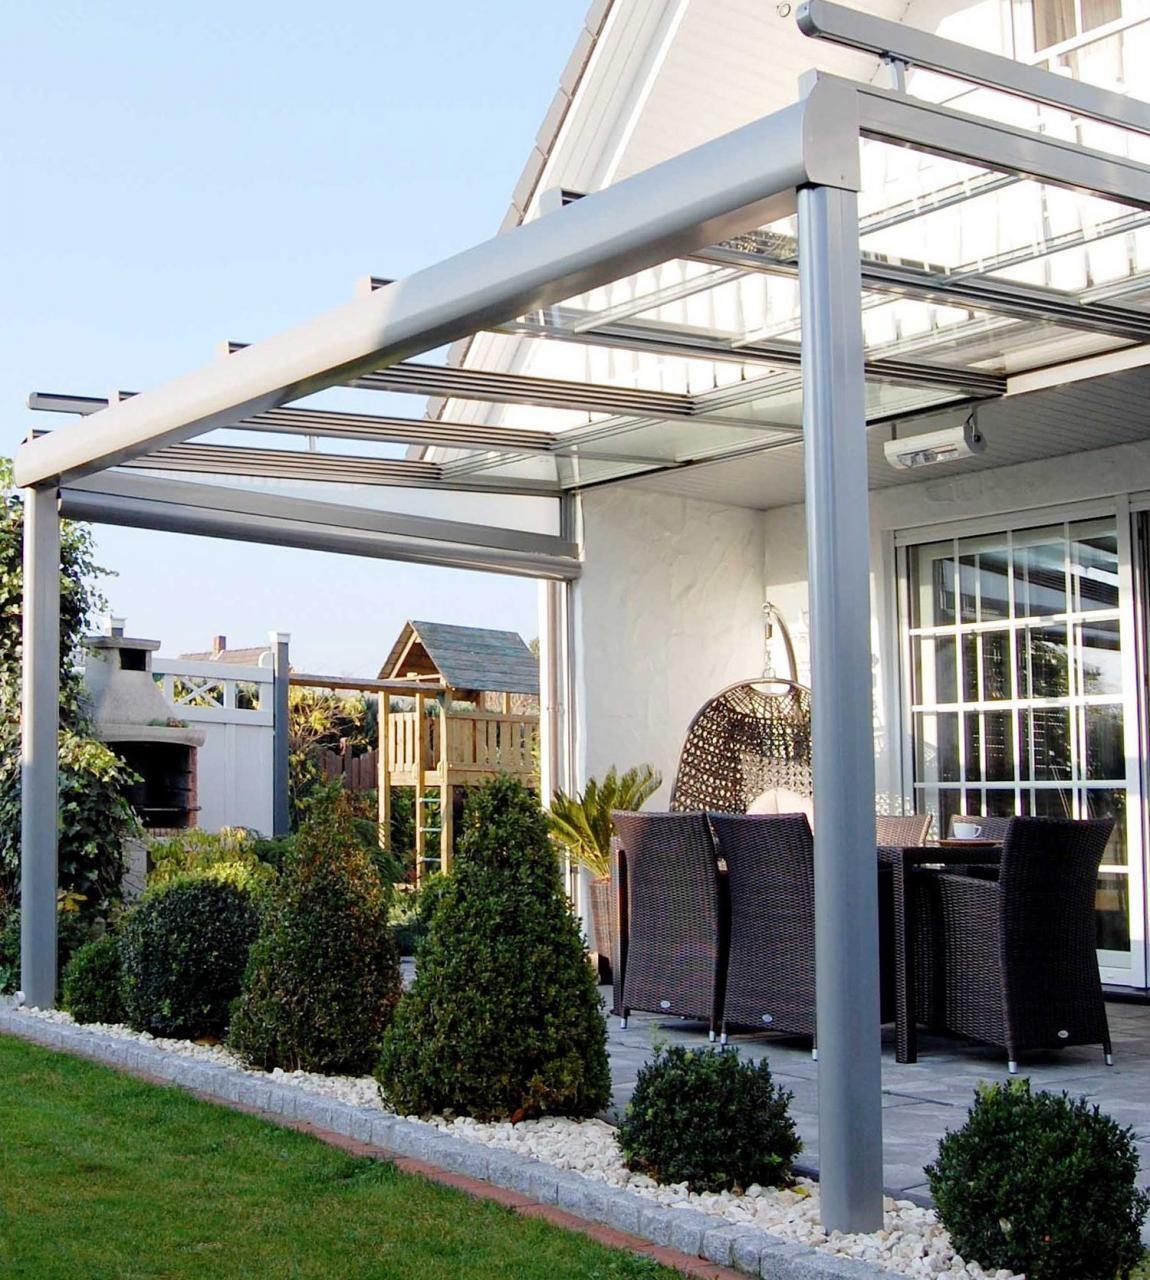 ▷ terrasse: ideen, inspiration und praktische tipps - [living at, Gartengerate ideen